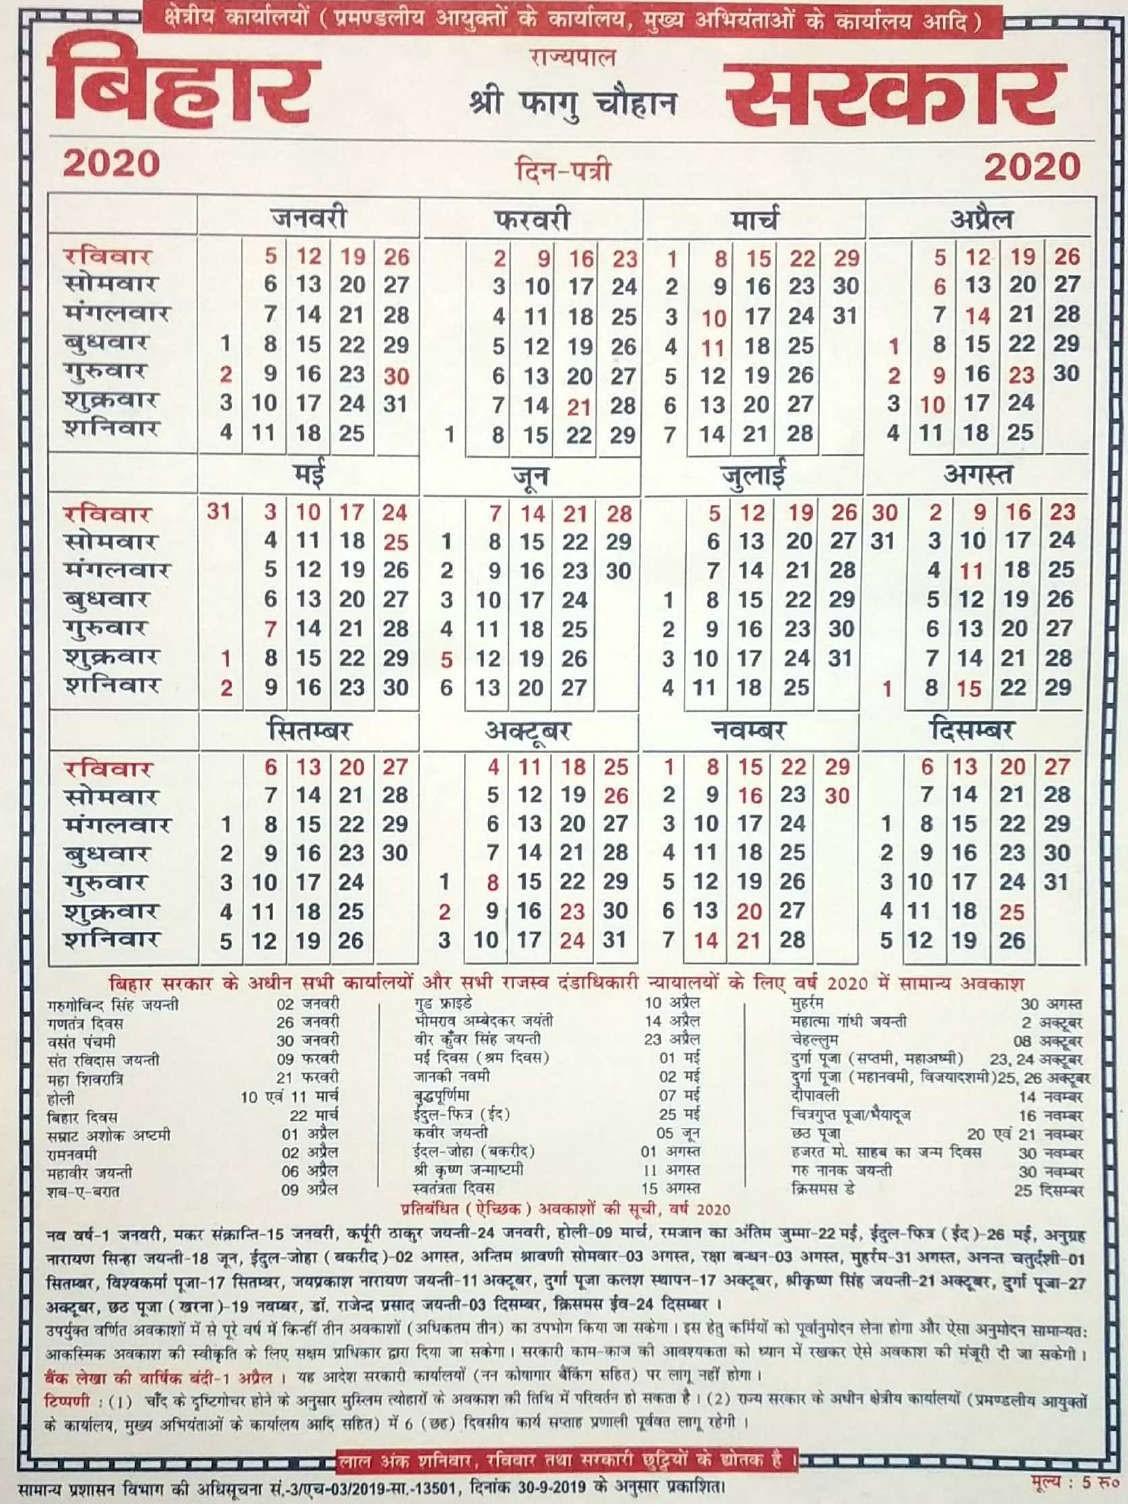 Bihar Sarkar Calendar 2020 Pdf | Seg  2020 Bihar Sarkar Ka Calendar